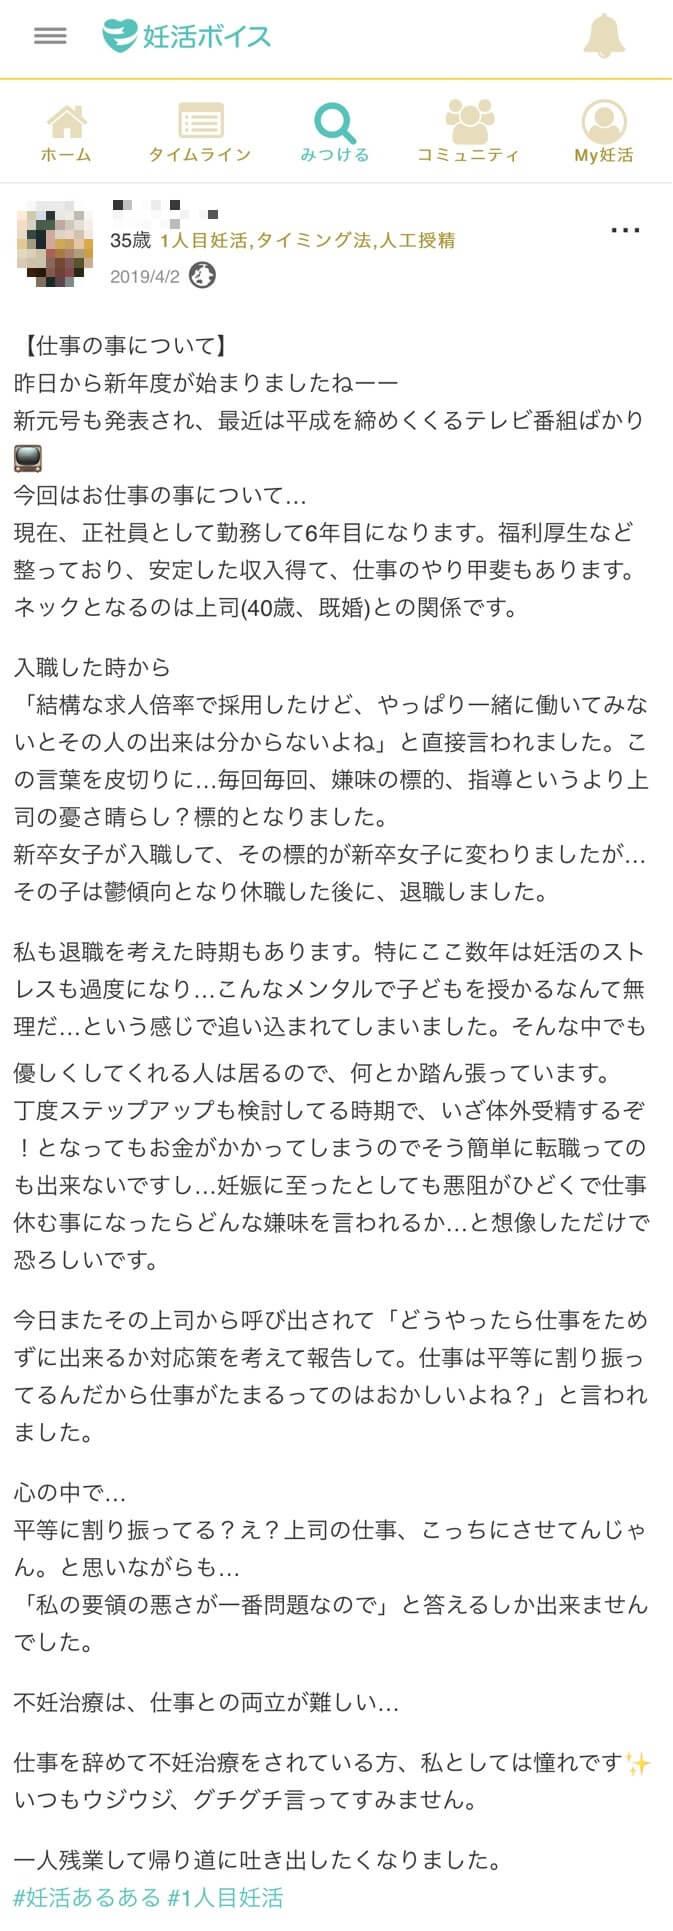 Noさん(35歳・1人目妊活・タイミング法・人工授精)